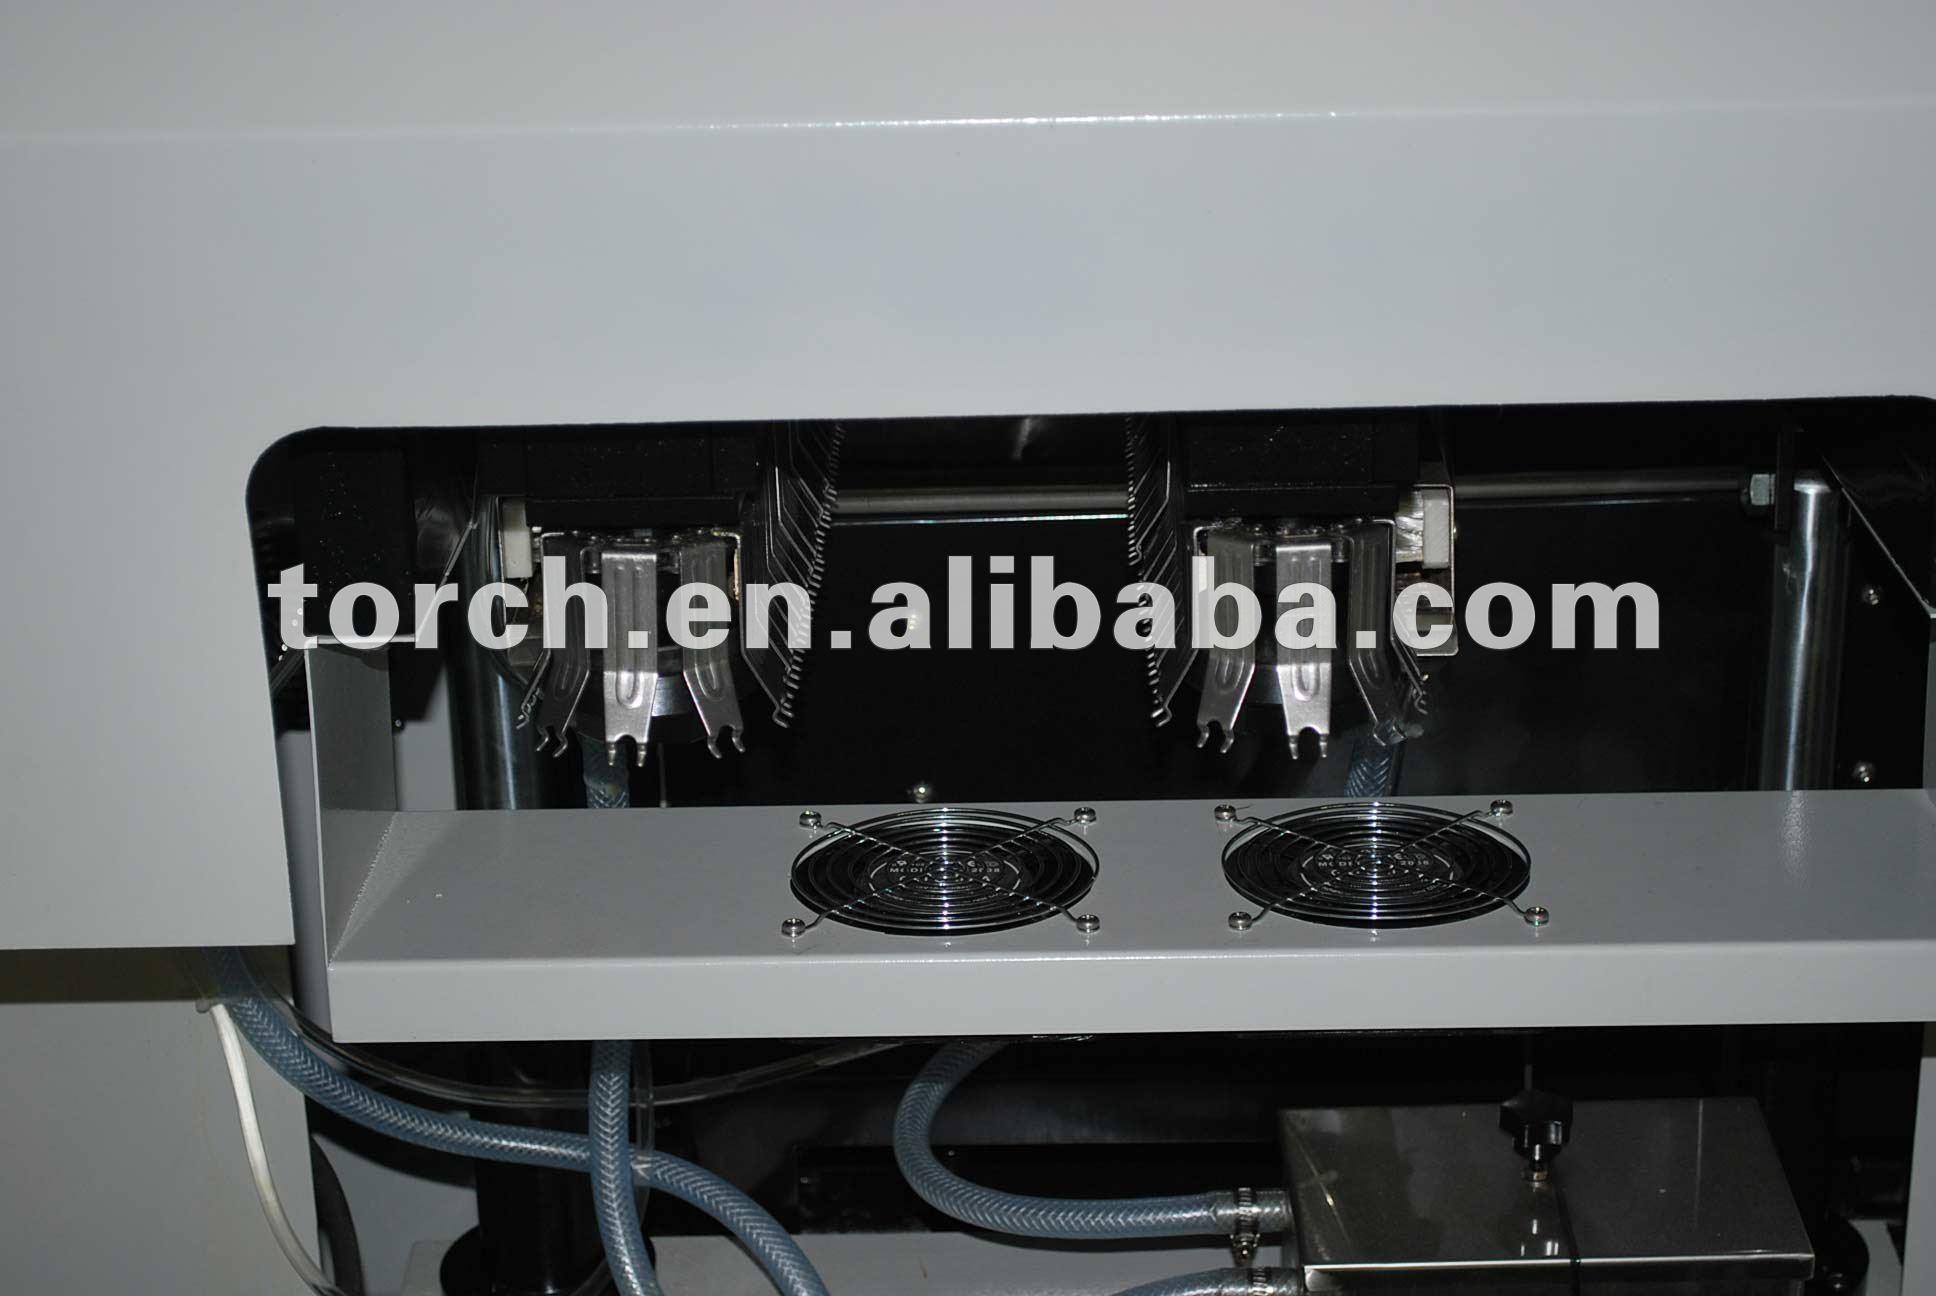 2014 мини волна аппарат для пайки, Bga печи оплавления компьютере волна печь TB780D